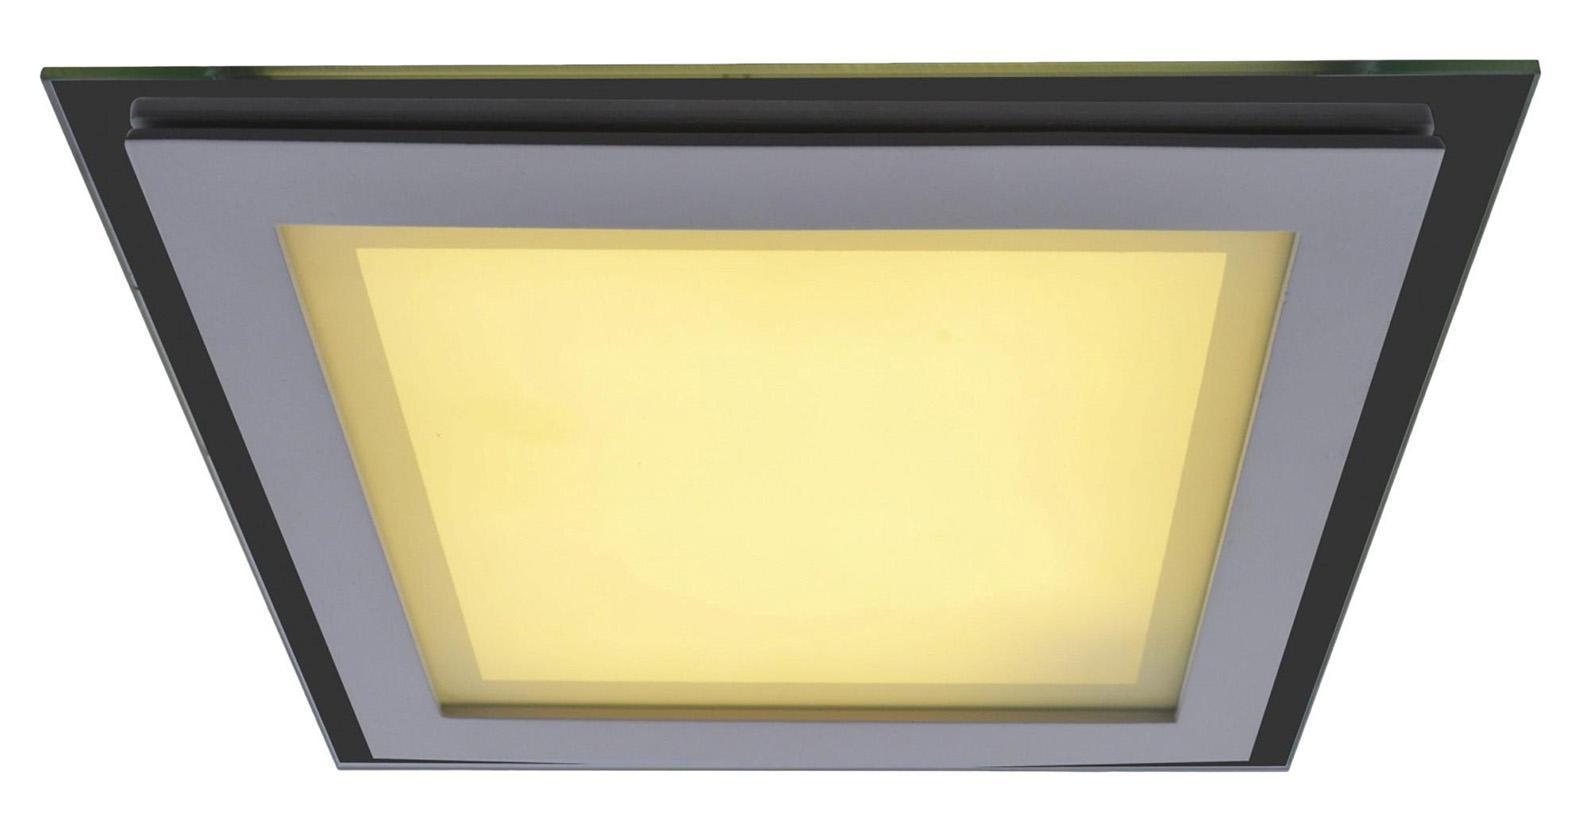 A4018PL-1WH RAGGIO Встраиваемый светильникA4018PL-1WH18W LED; 1440 lm Материал: Арматура: Алюминий / Элемент декора: Стекло Размер: 210x210x45 Цвет: Белый